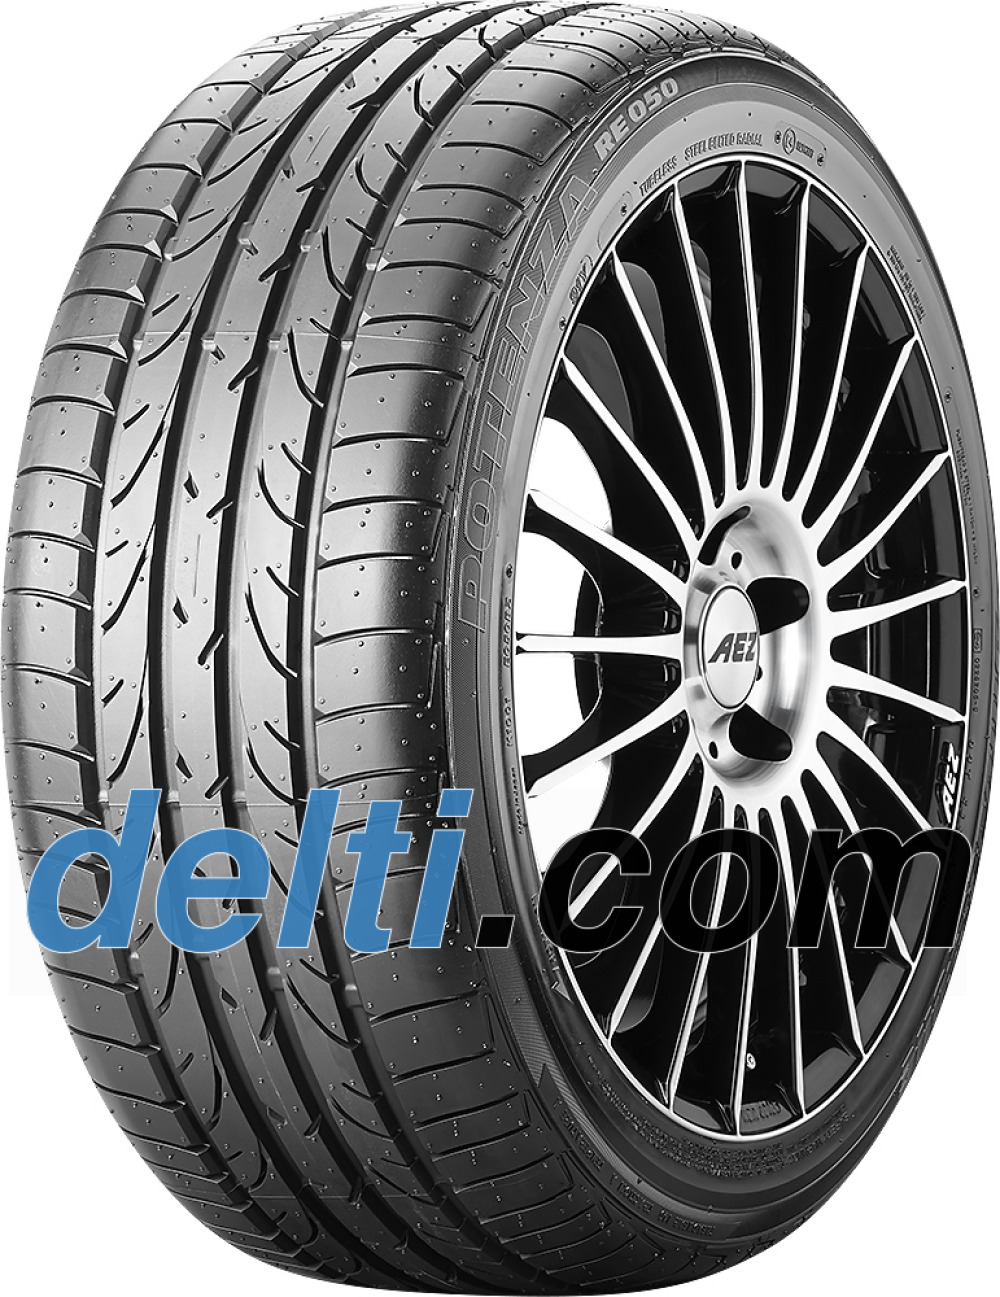 Bridgestone Run Flat >> Bridgestone Potenza Re 050 Rft